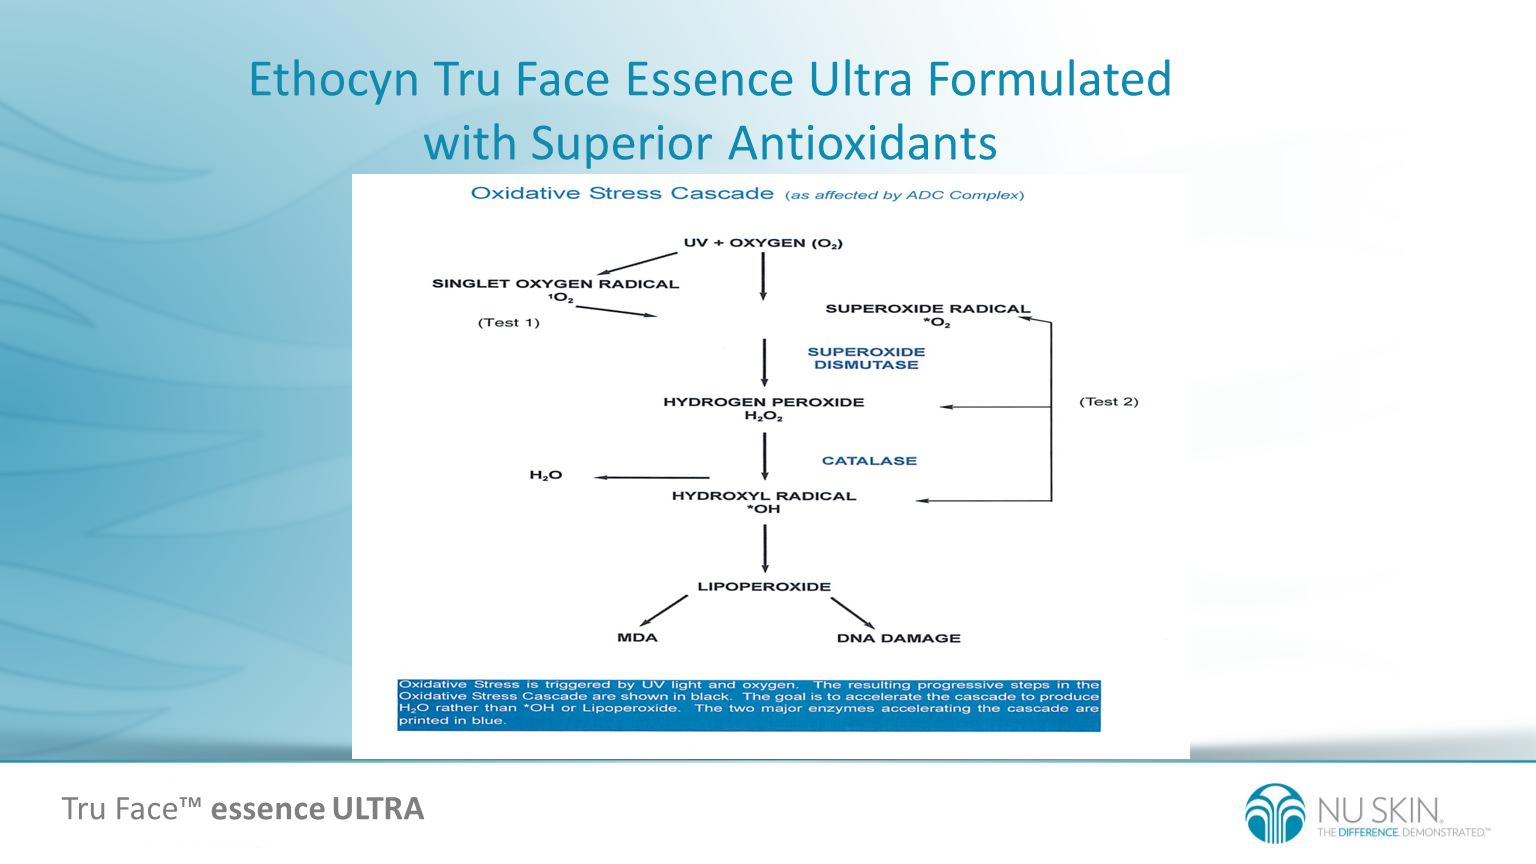 Ethocyn Tru Face Essence Ultra Formulated with Superior Antioxidants